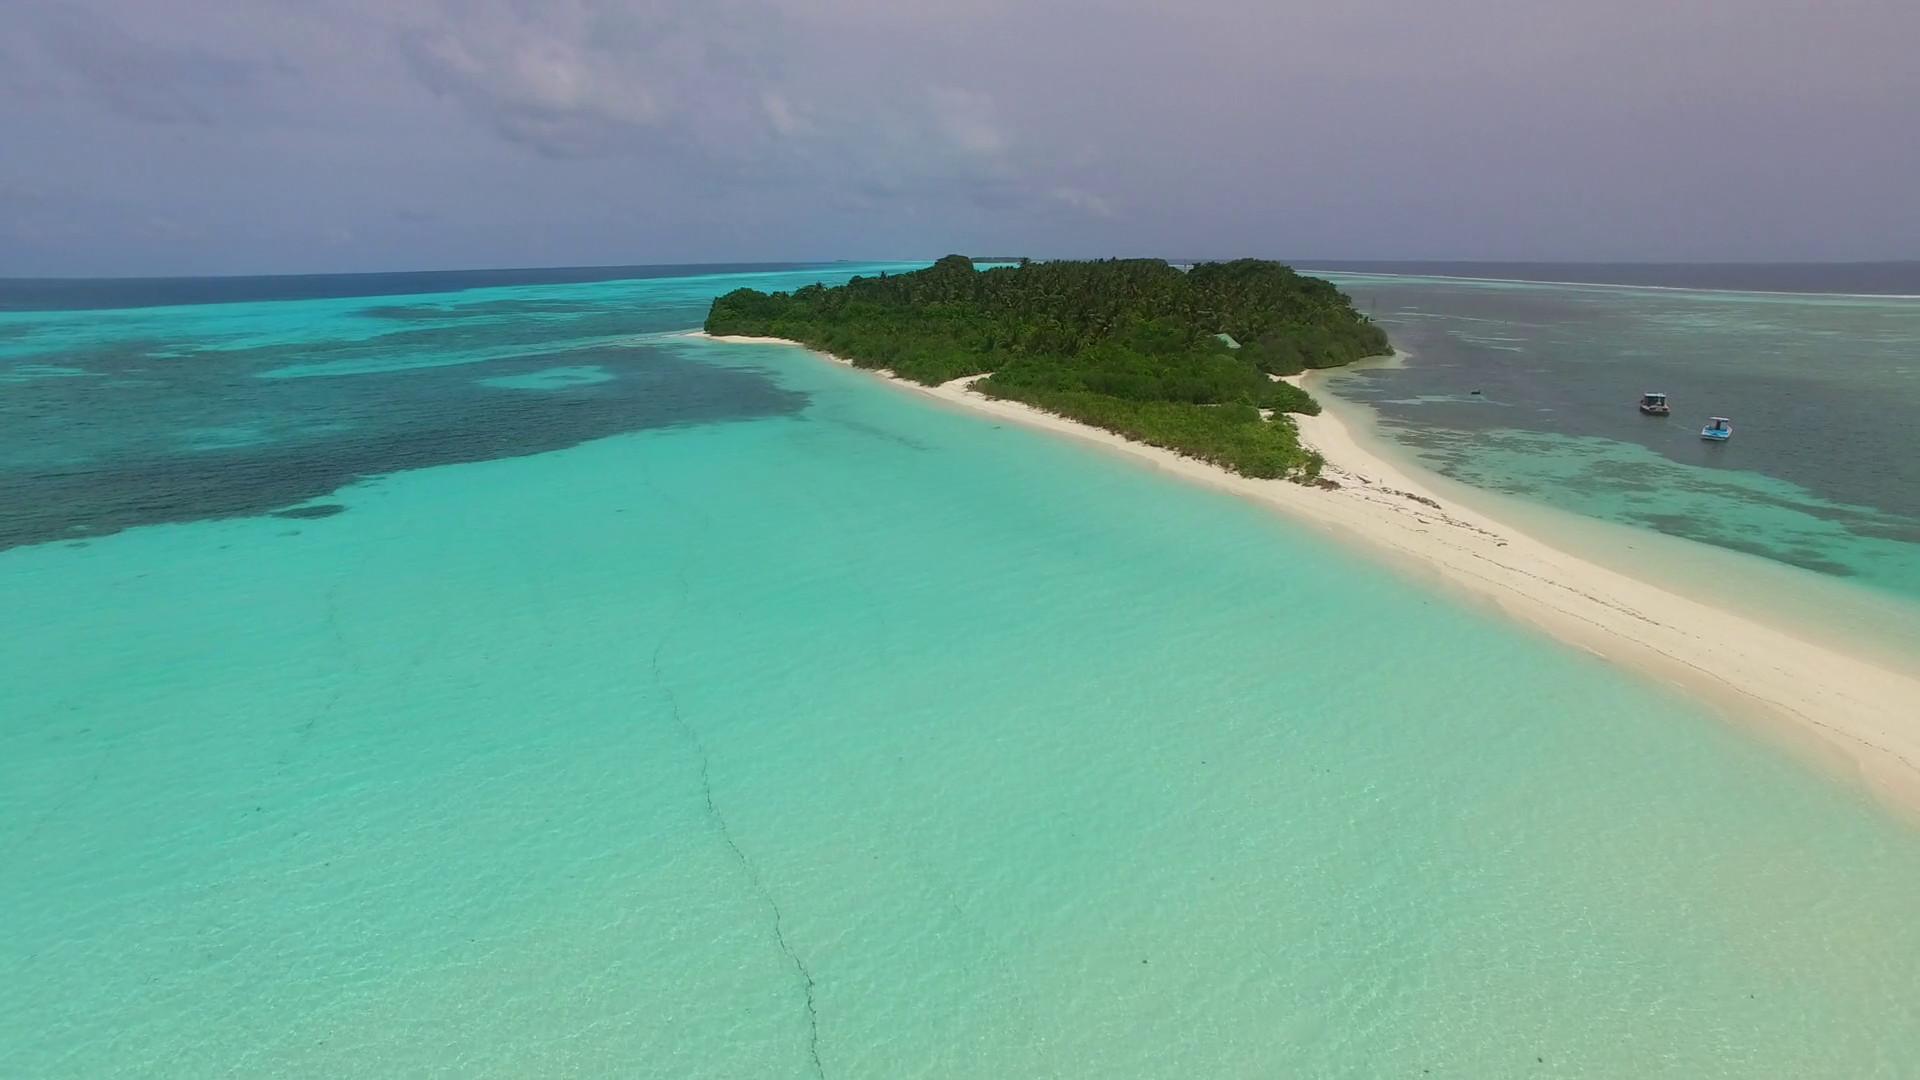 Hd Tropical Island Beach Paradise Wallpapers And Backgrounds: Tropical Island Background (57+ Images